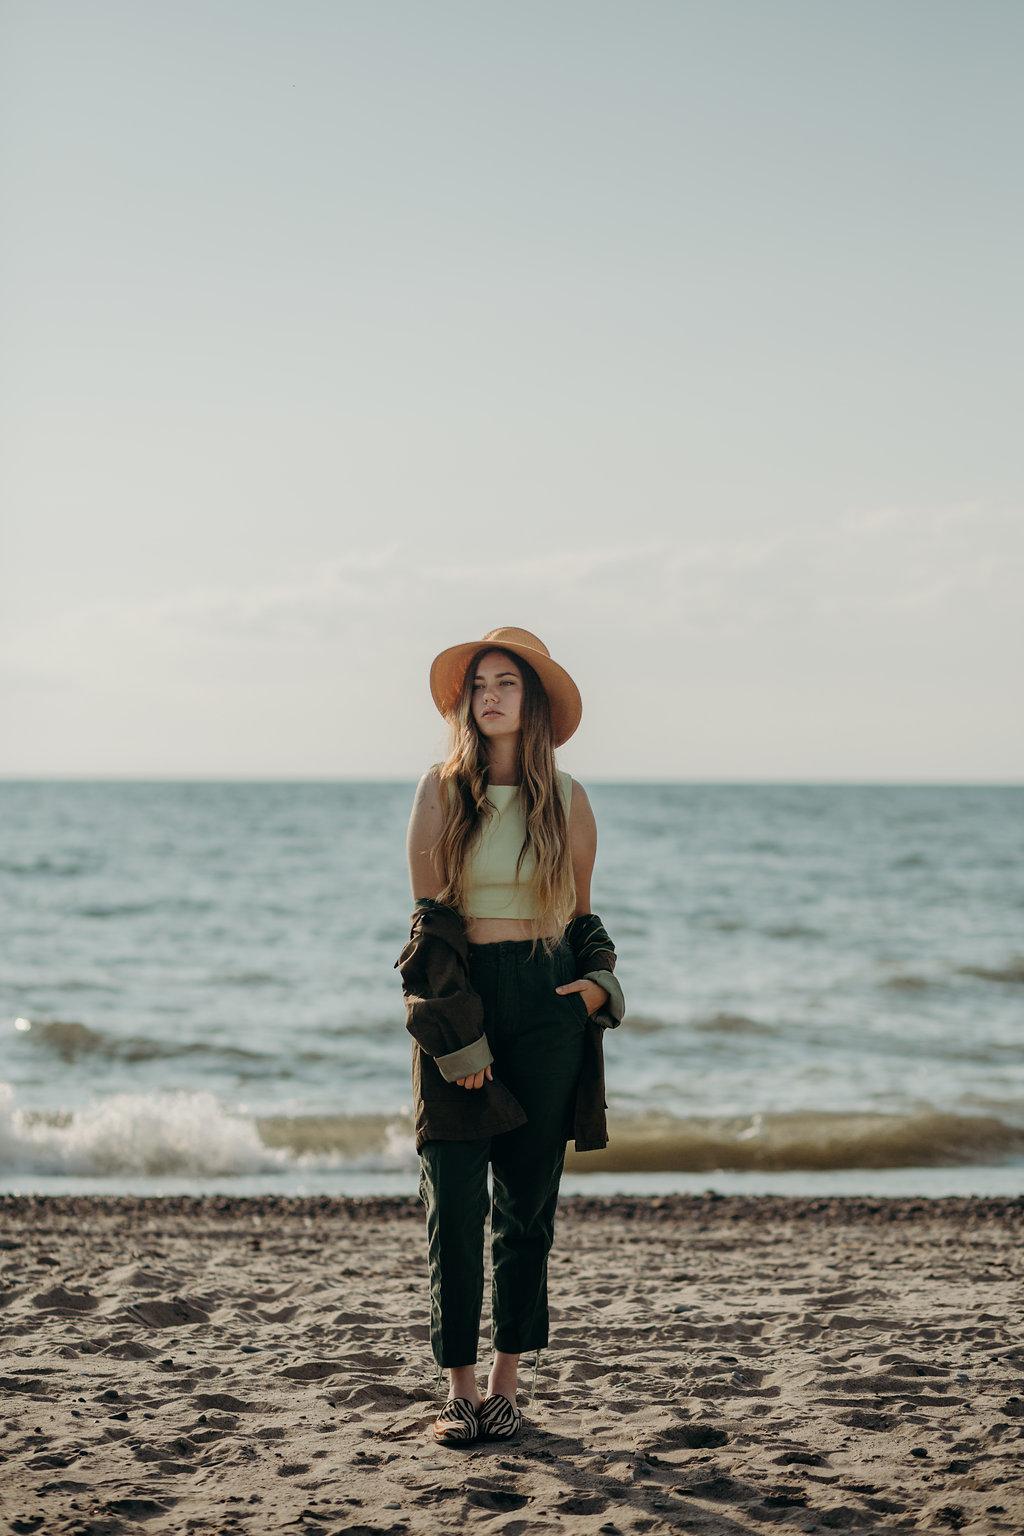 HEADLANDS BEACH OHIO | MAGAN 19